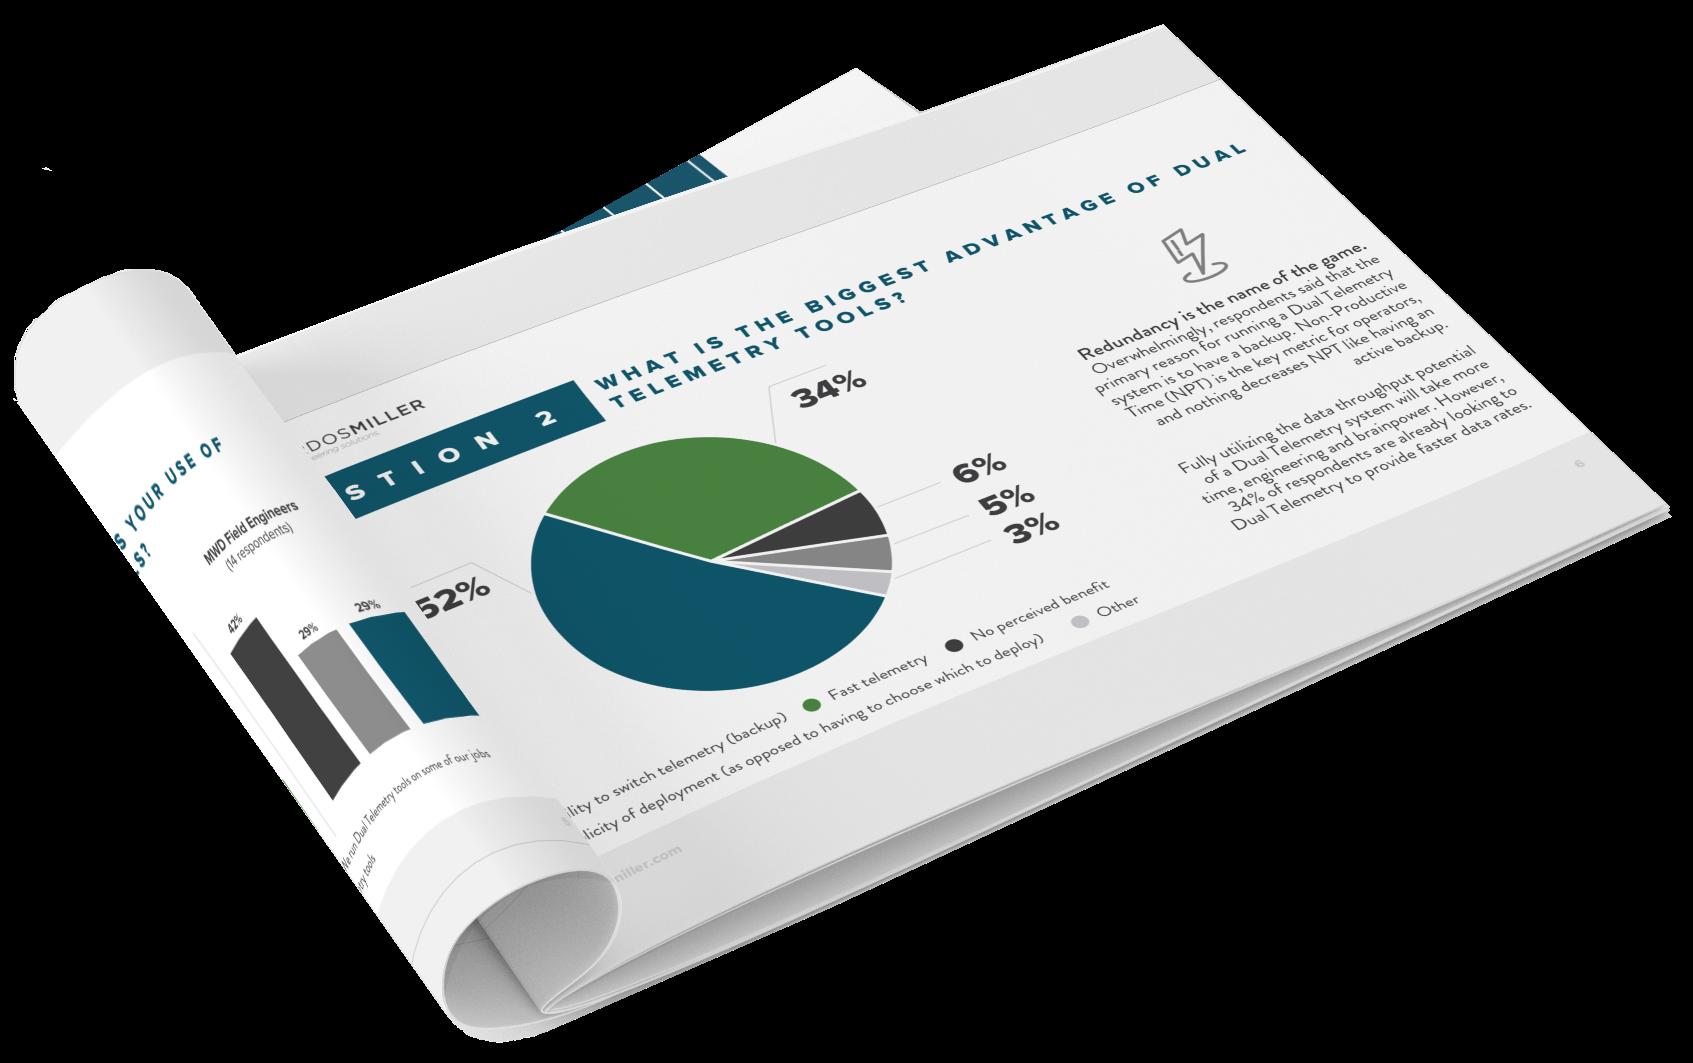 Dual Telemetry Tools Survey Report Erdos Miller